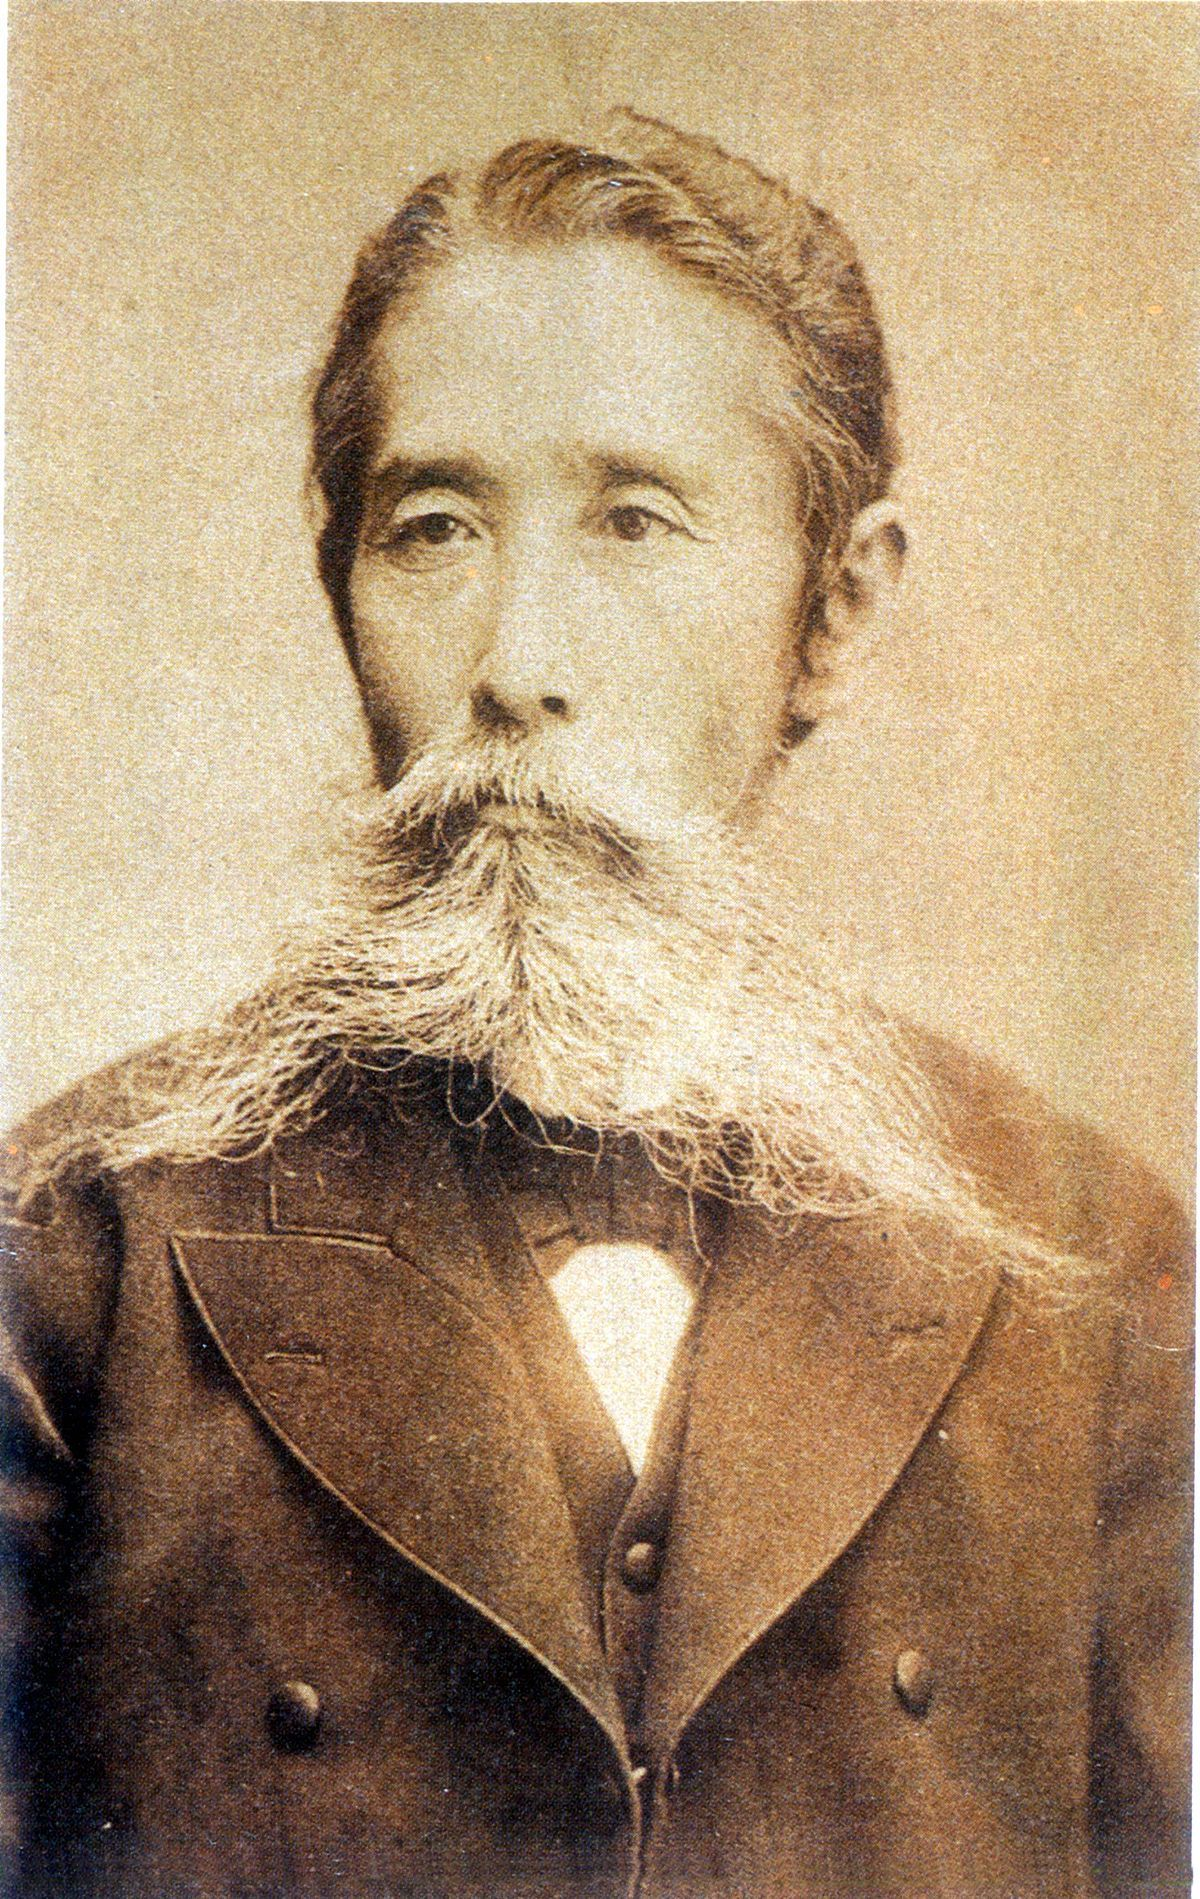 itagaki taisuke wikipedia 幕末 写真 古い写真 近代史